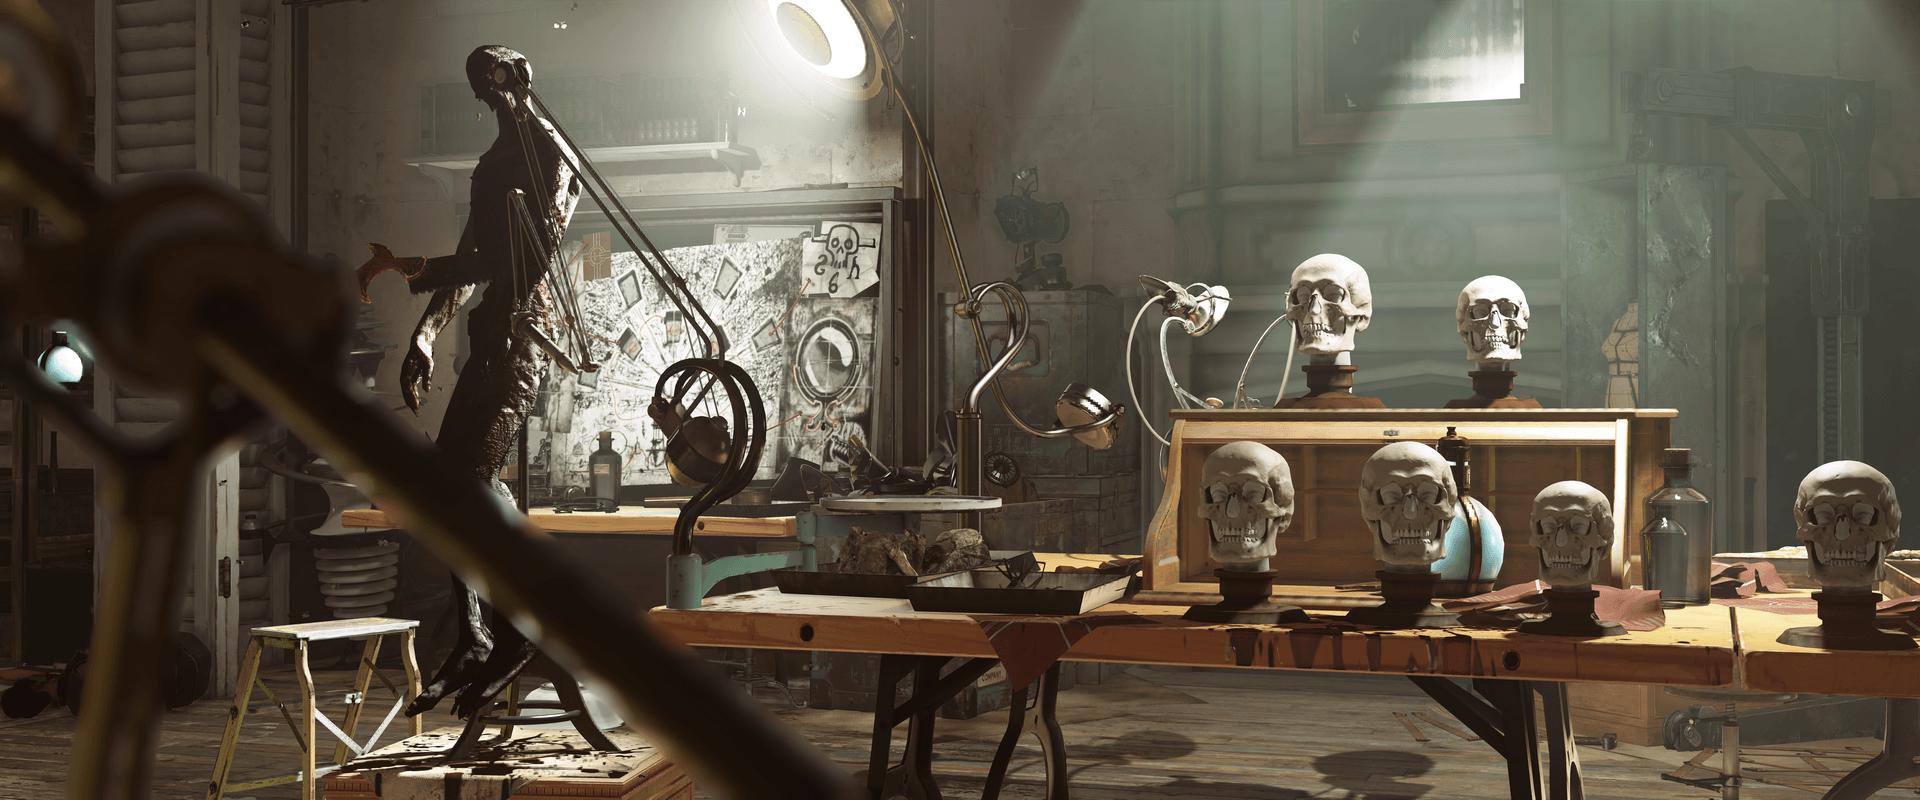 Nové screenshoty z Dishonored 2 130243